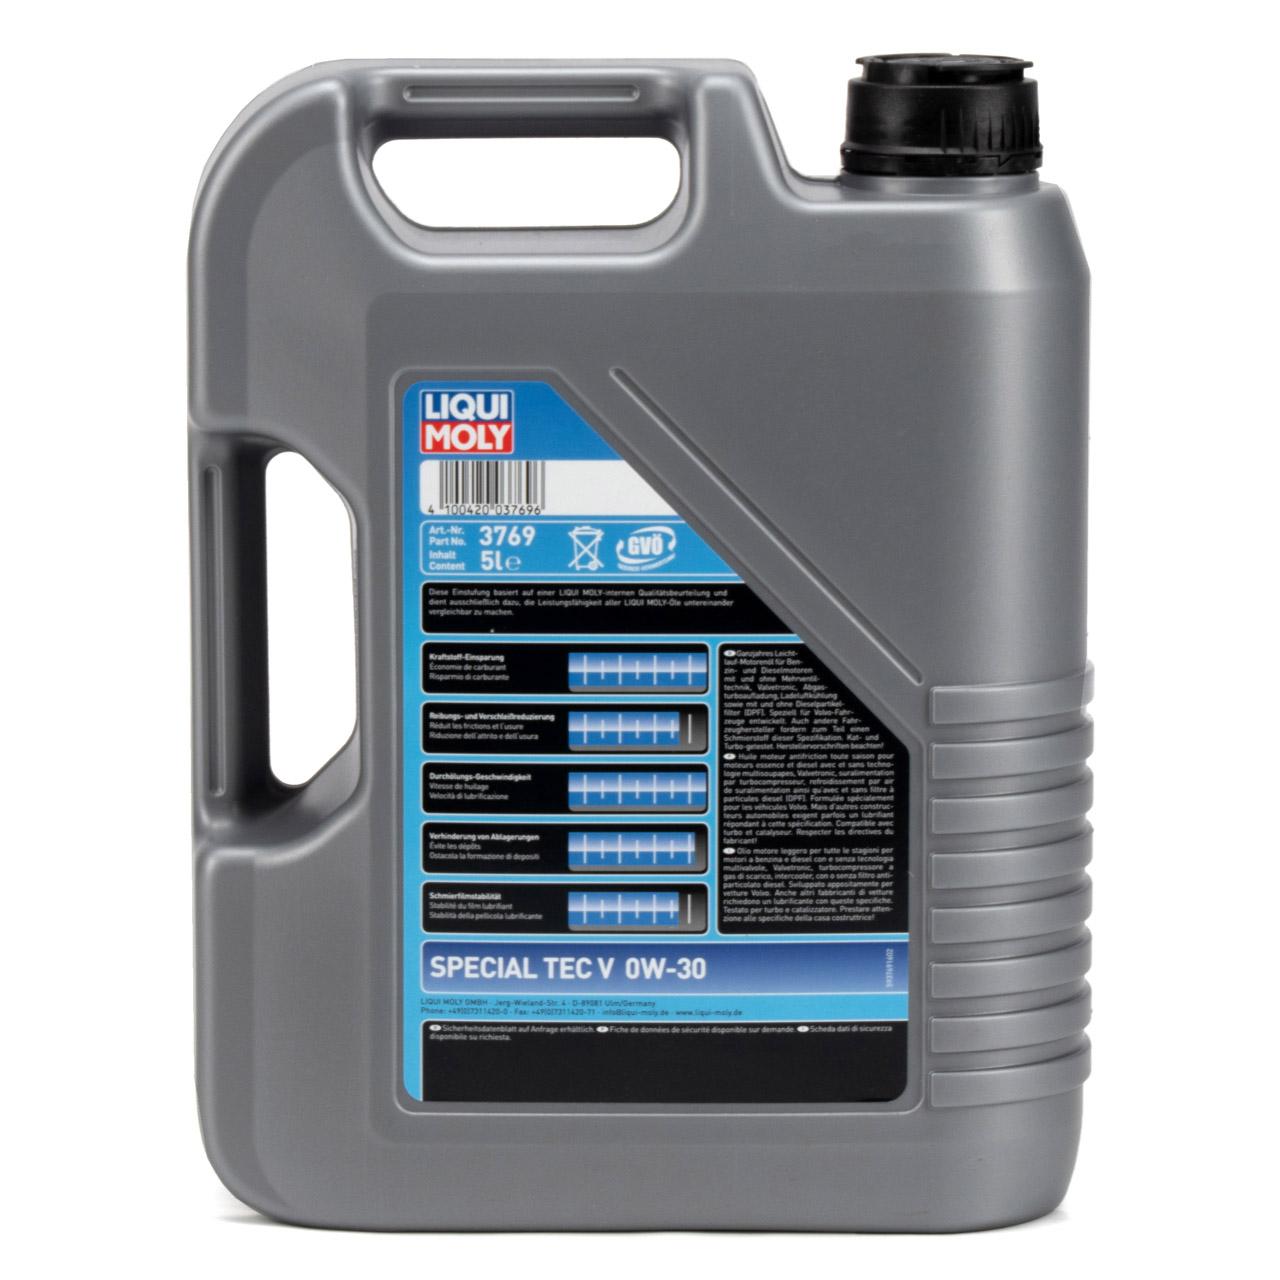 LIQUI MOLY Motoröl Öl SPECIAL TEC V 0W-30 0W30 Volvo VCC 95200377 - 5L 5 Liter